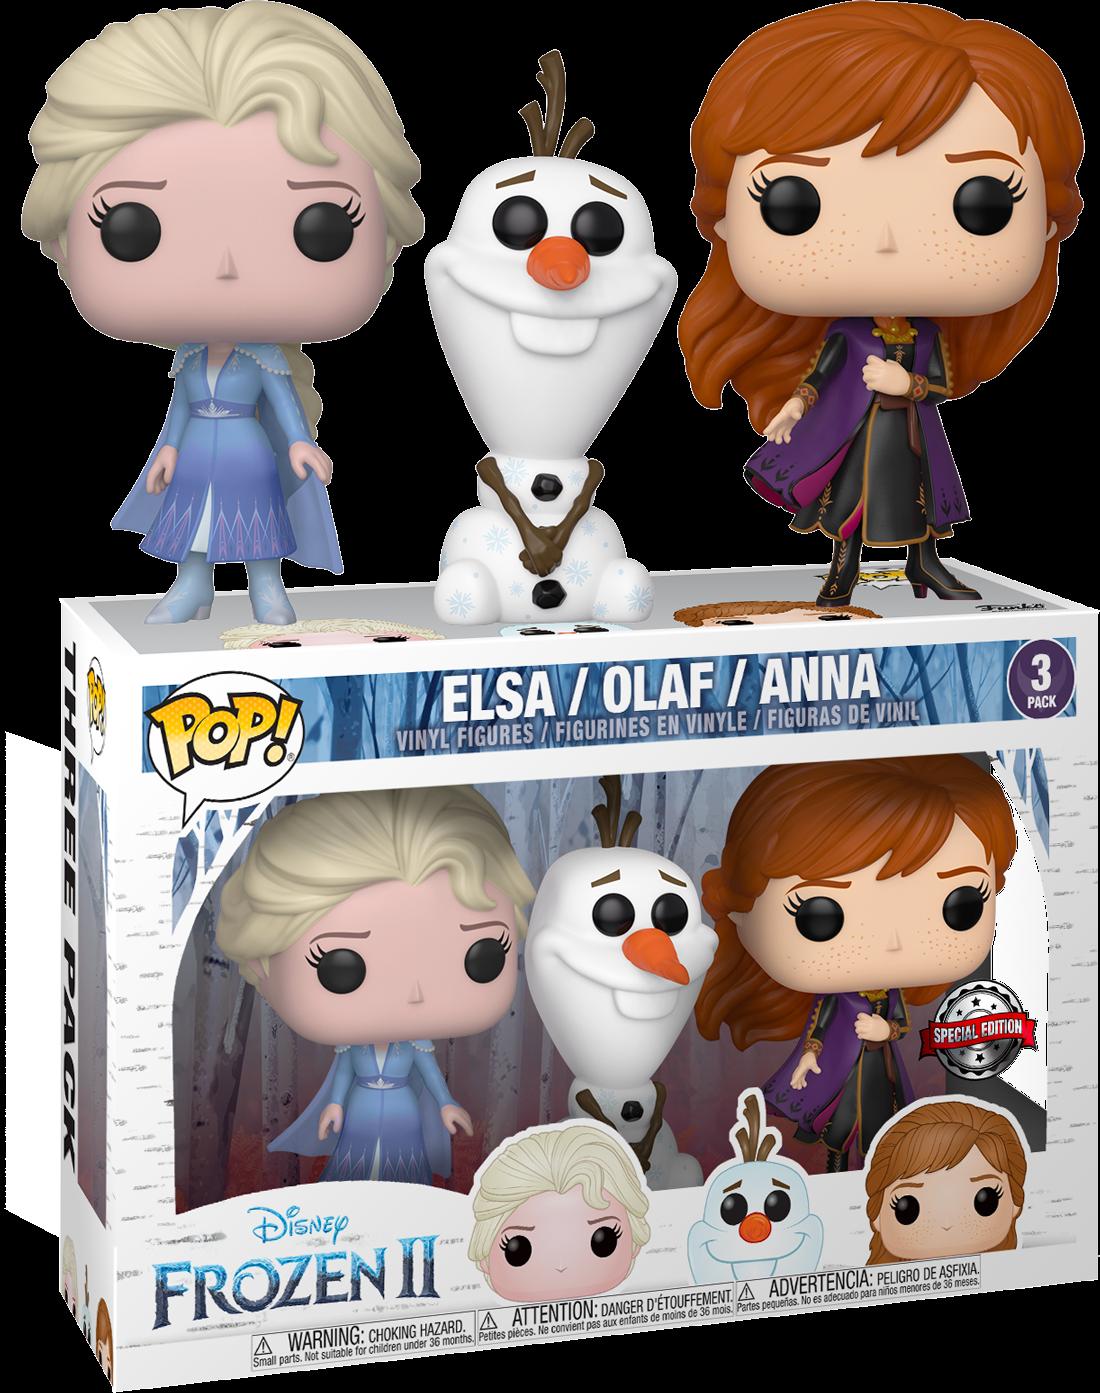 Frozen 2 POP! Disney Vinyl Figures 3-pack Anna, Elsa & Olaf Exclusive Edition 9 cm